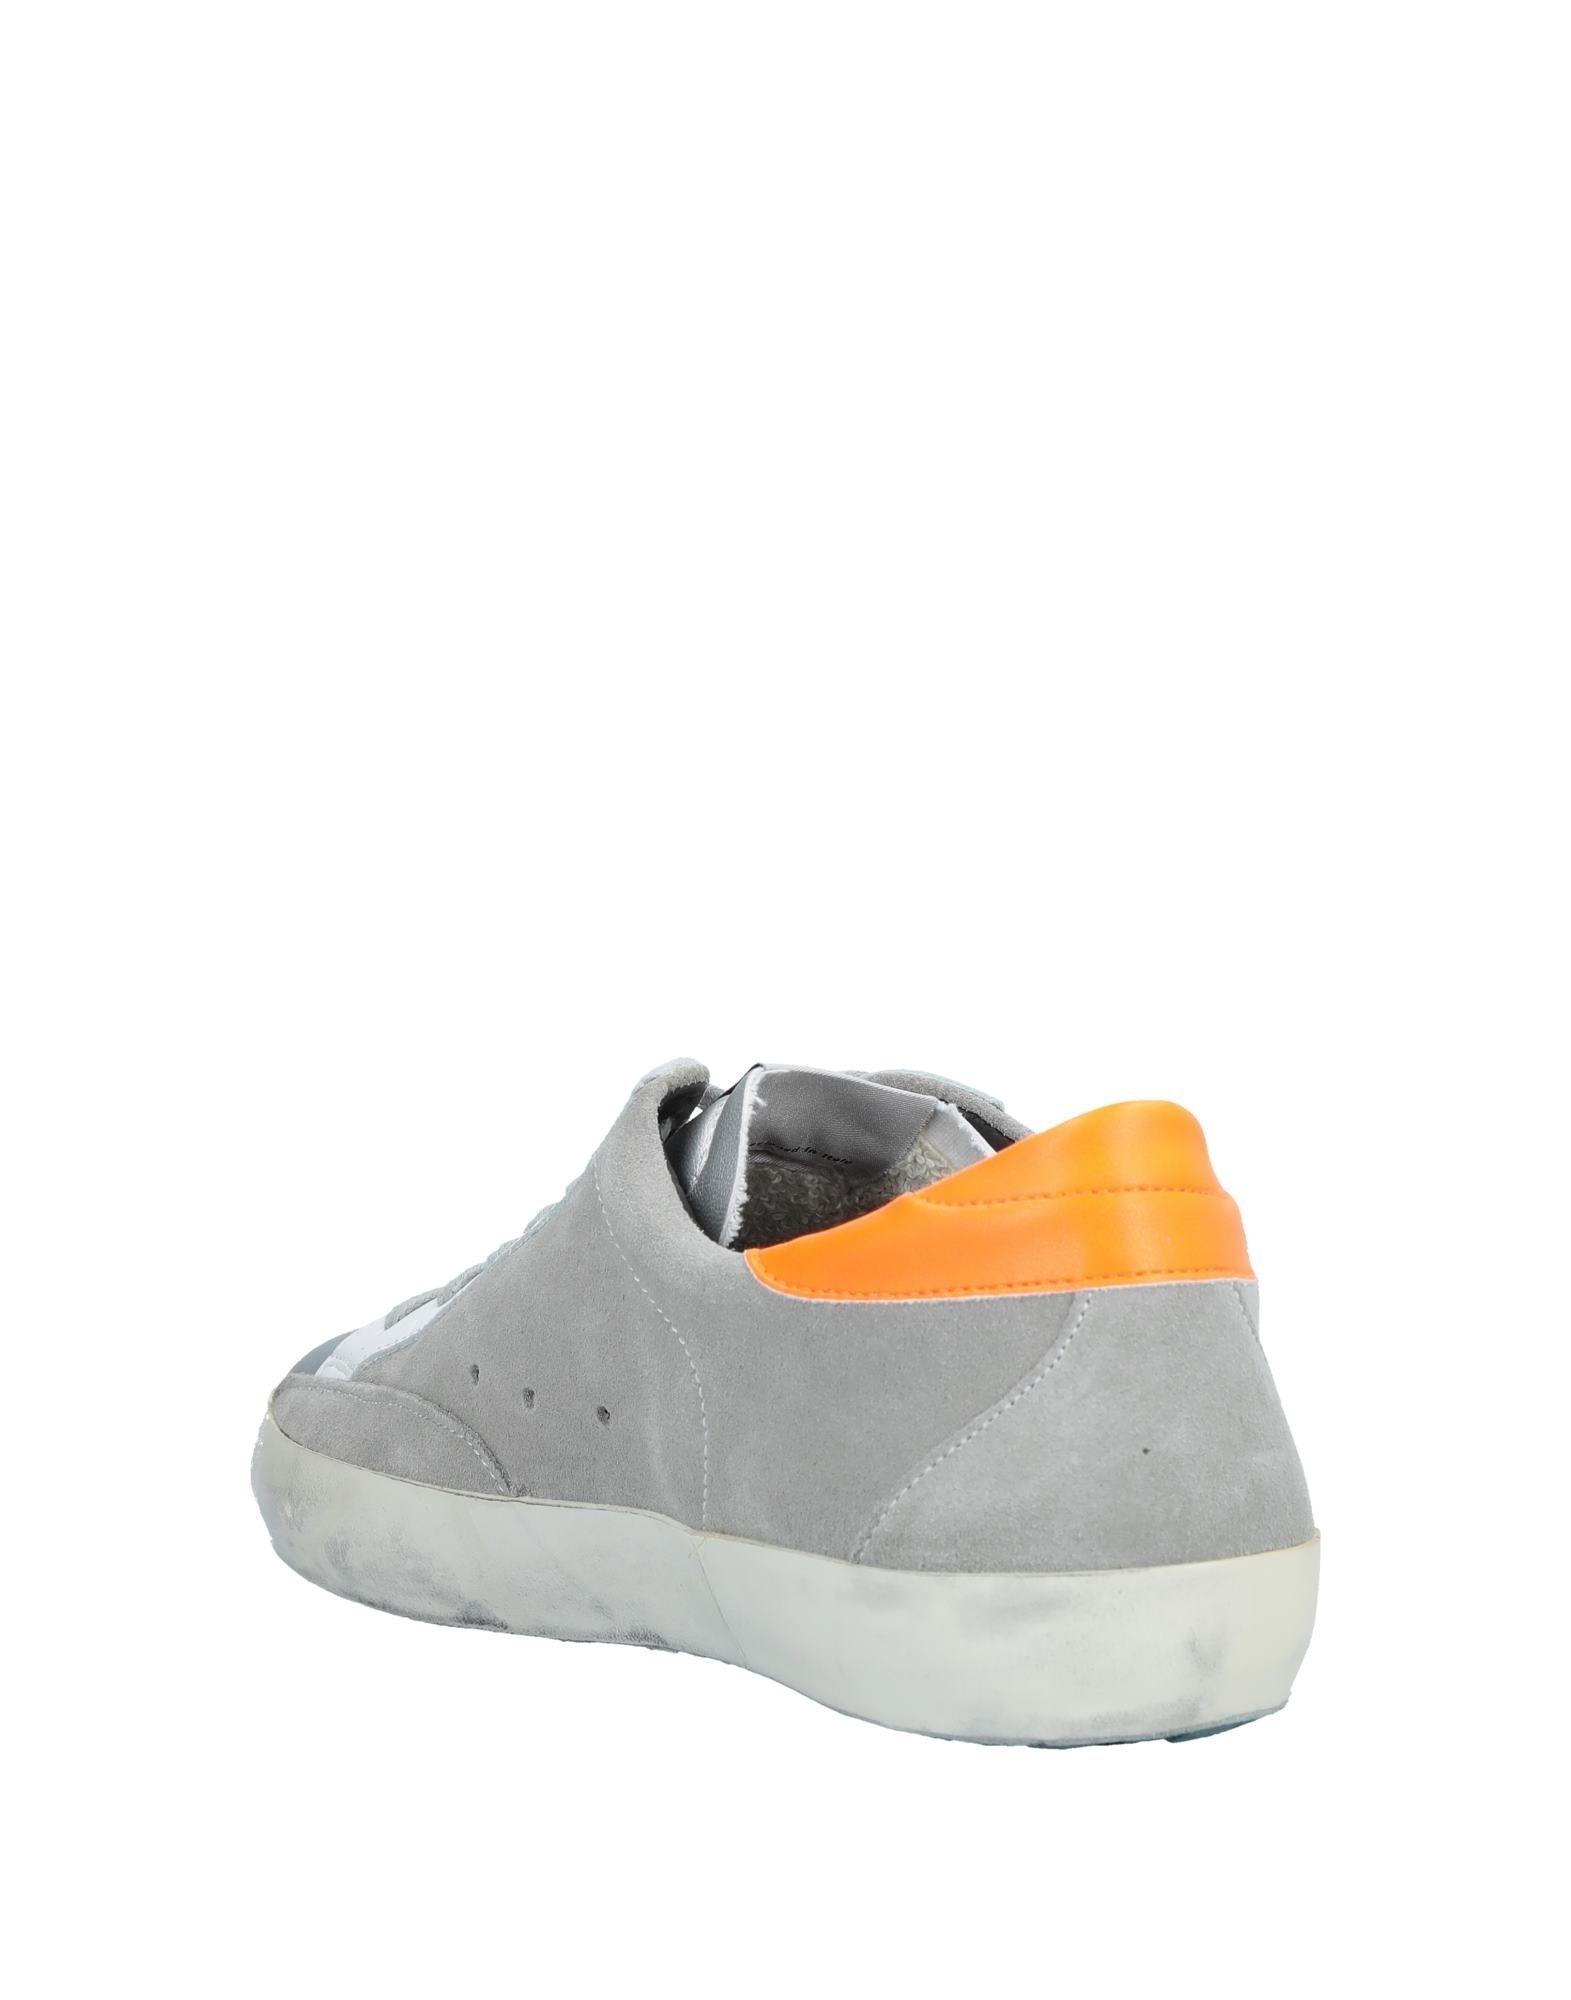 Rabatt echte Schuhe Quattrobarradodici Sneakers 11538180VB Herren  11538180VB Sneakers 1e8c62